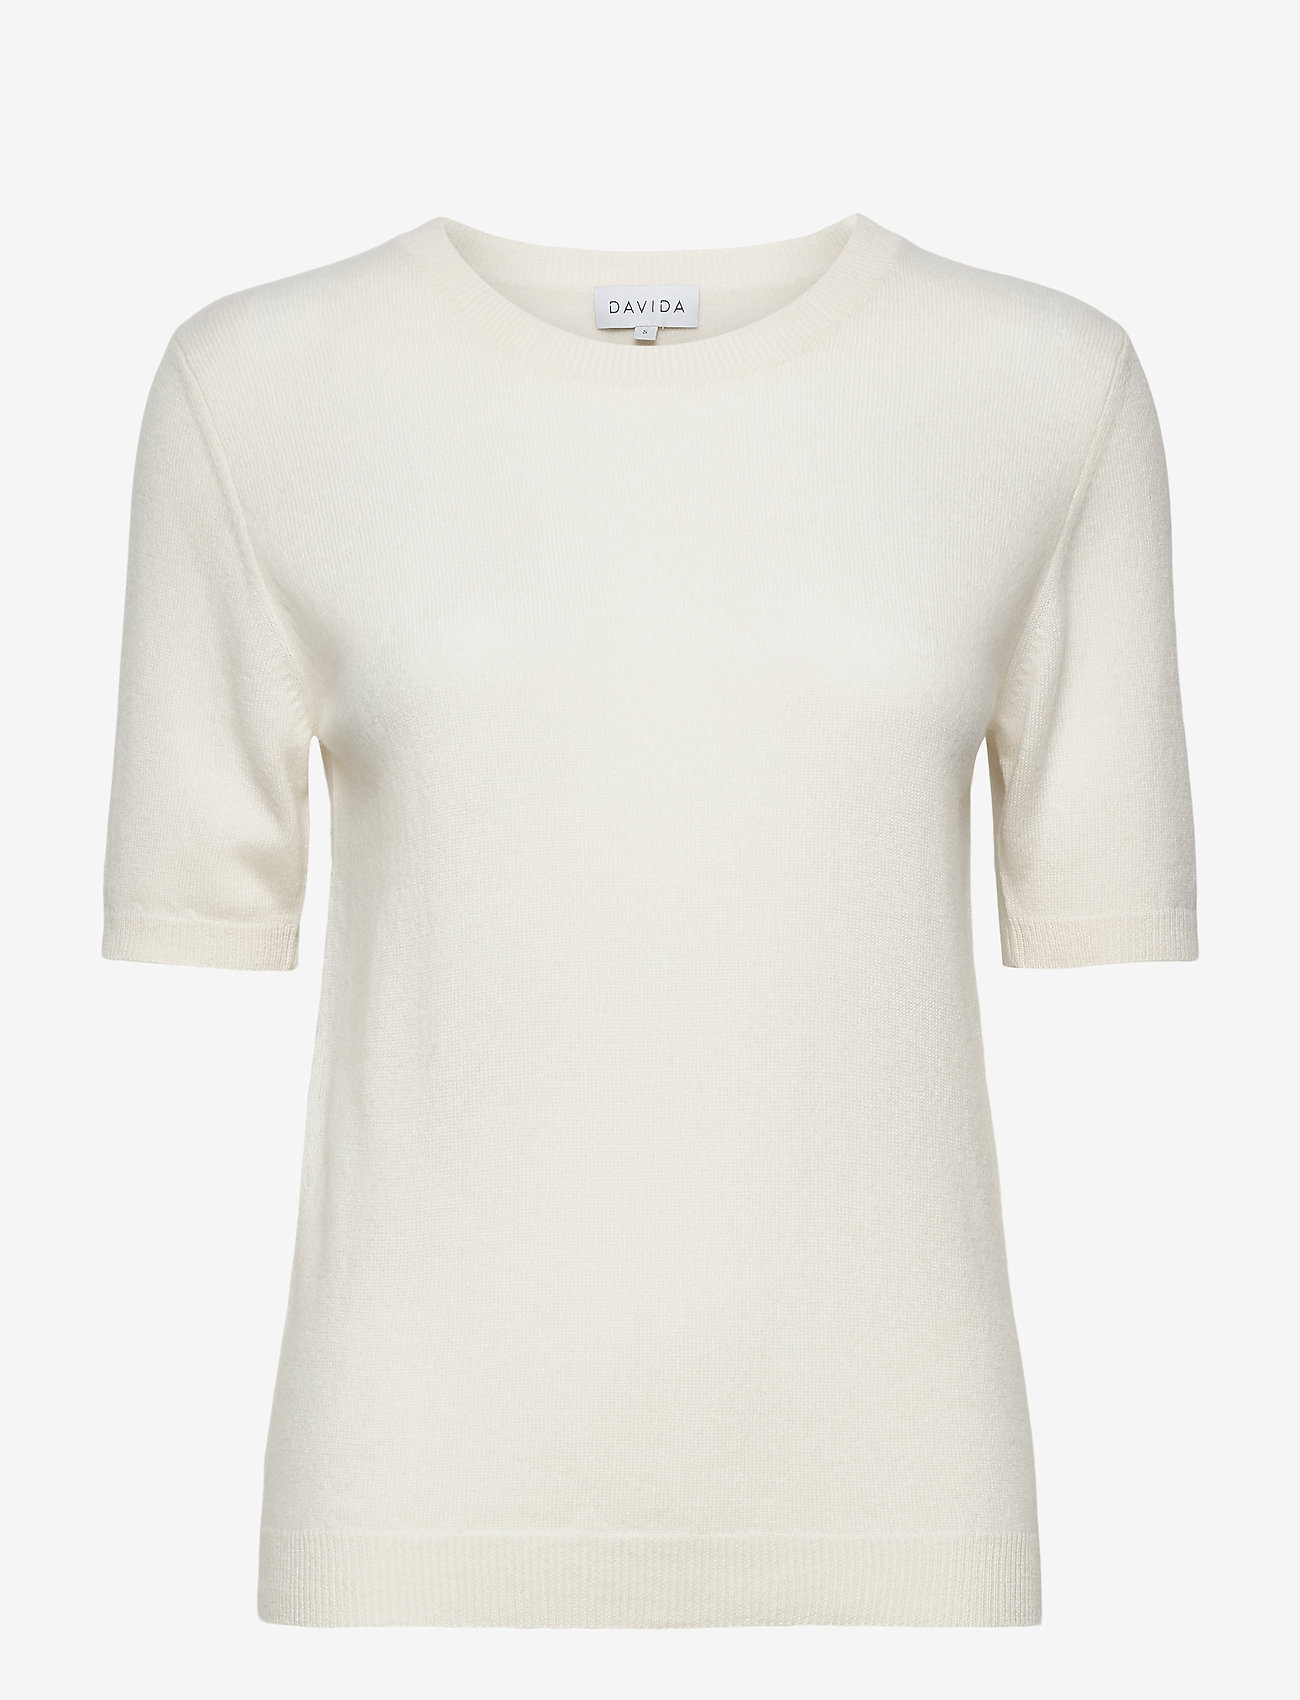 Davida Cashmere - T-shirt Oversized - gebreide t-shirts - white - 1